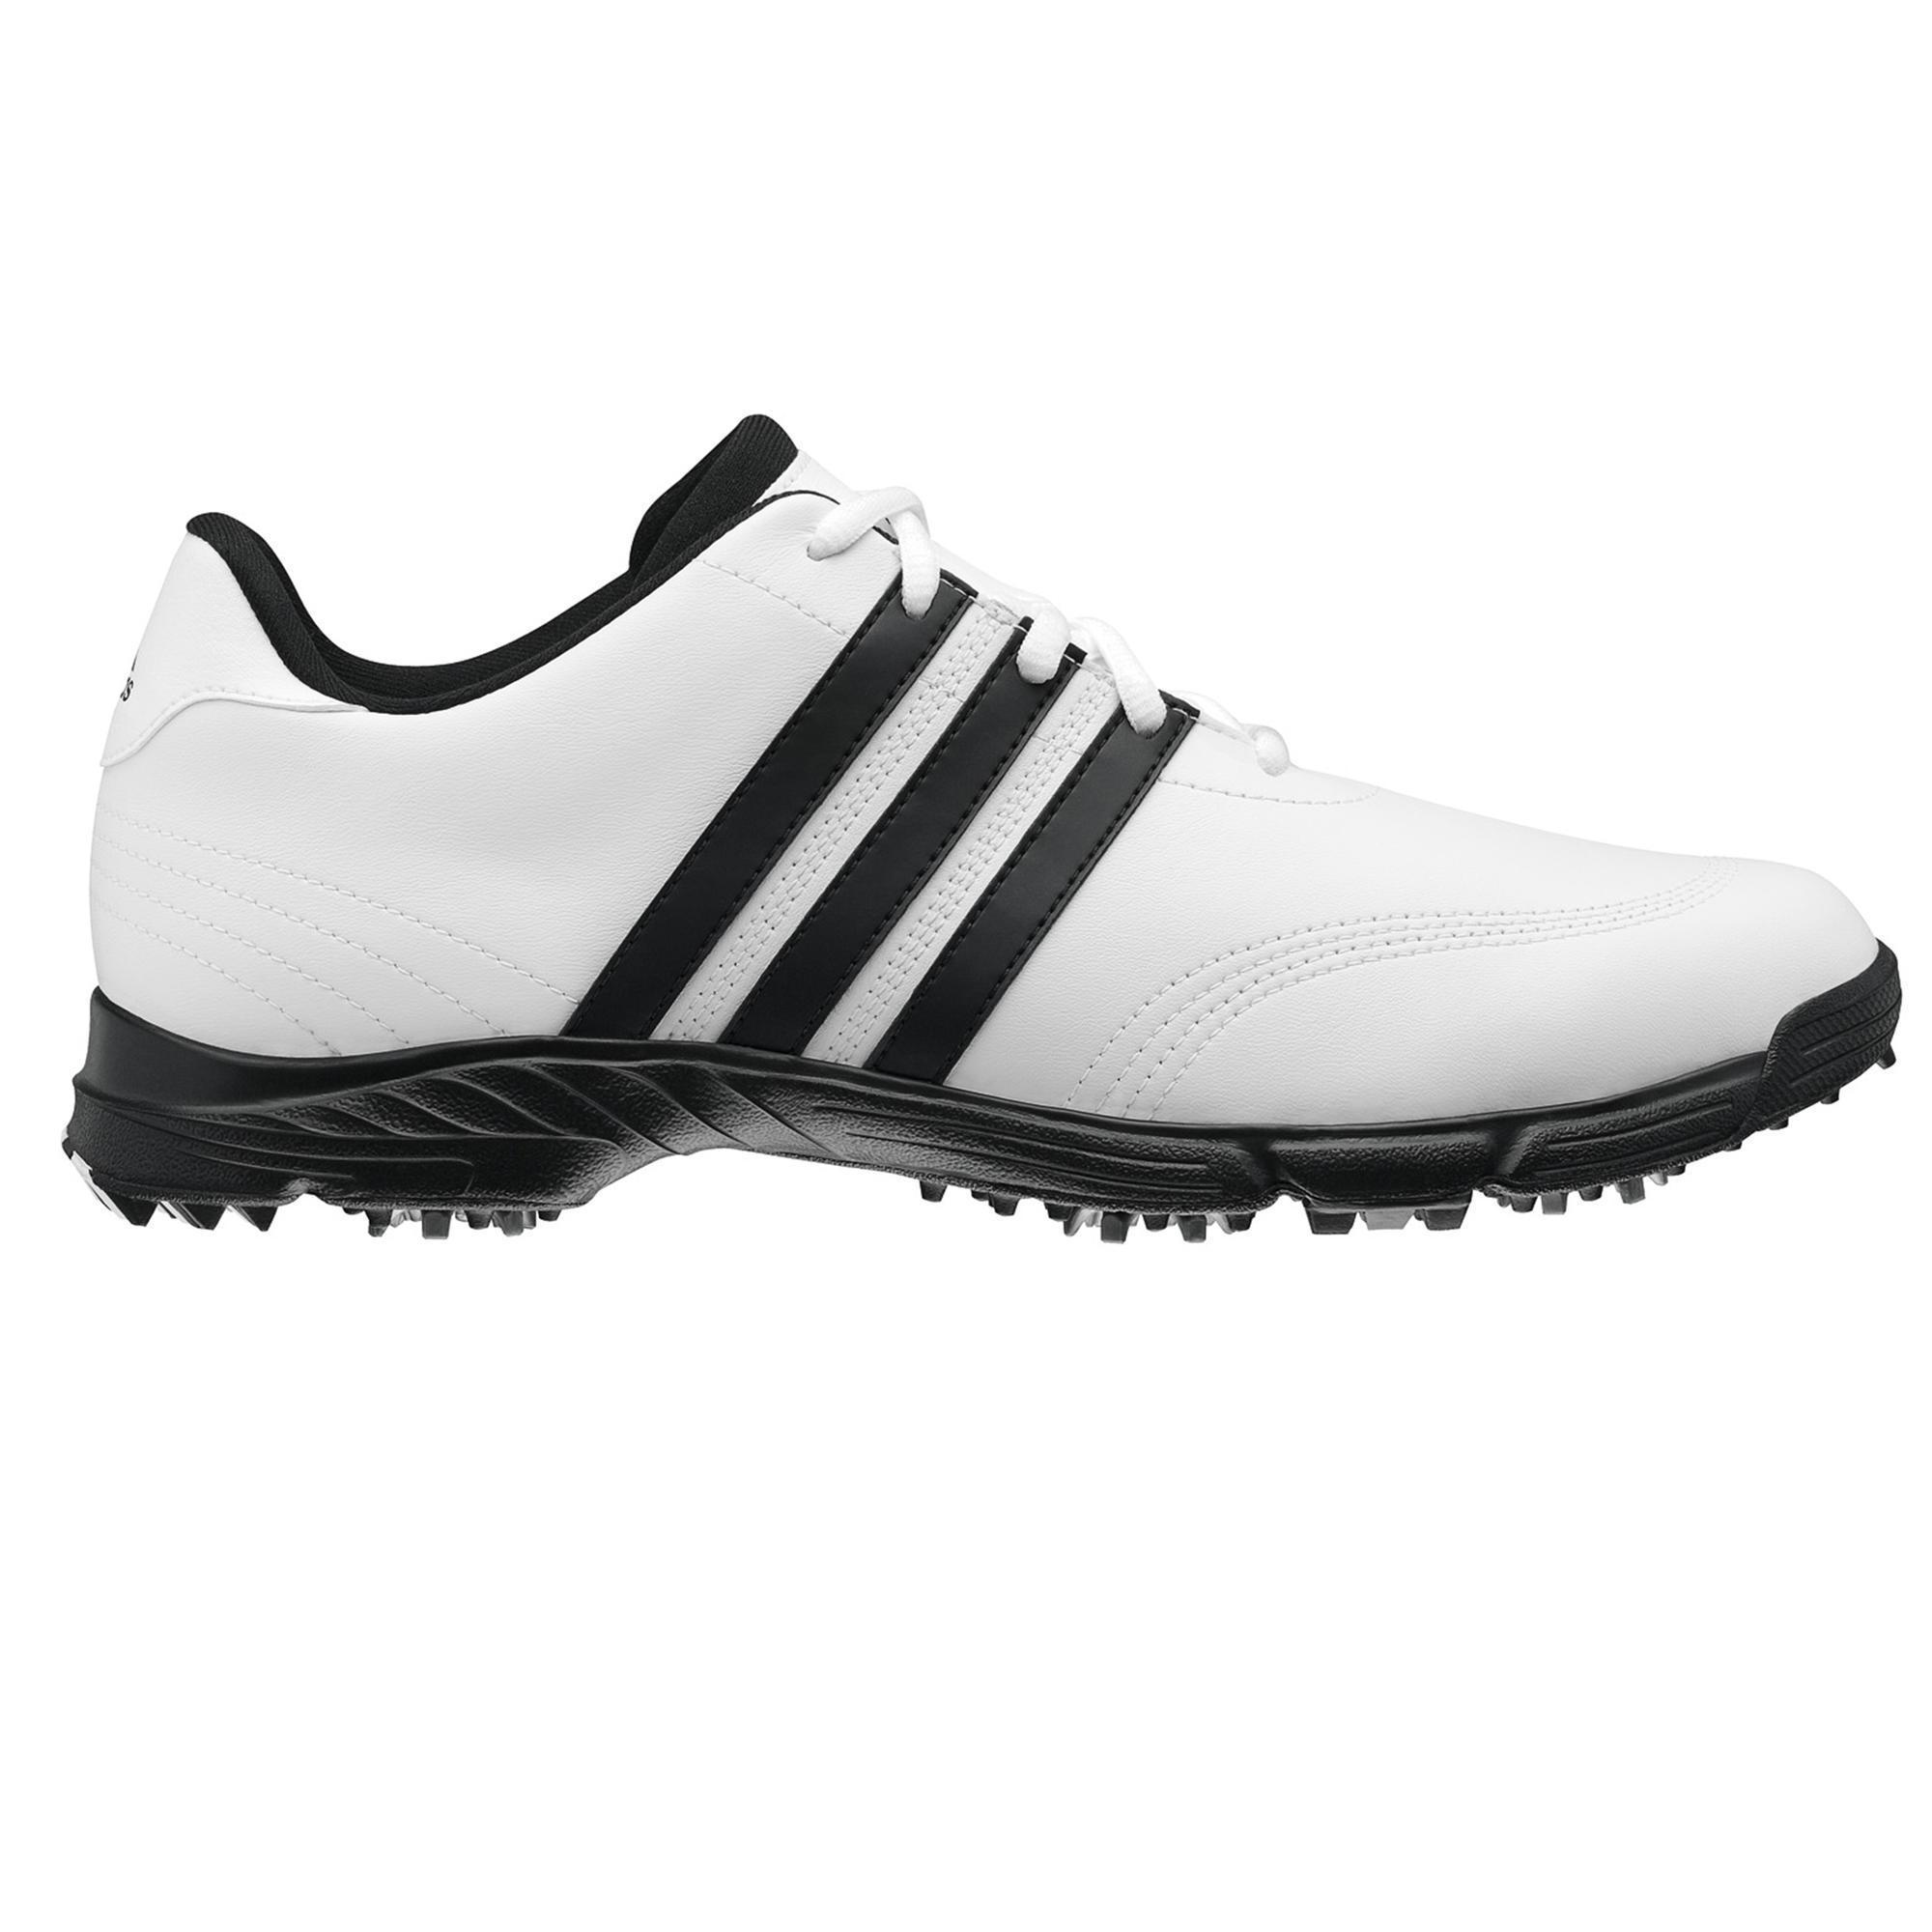 Adidas Waterdichte golfschoenen Golflite voor heren wit